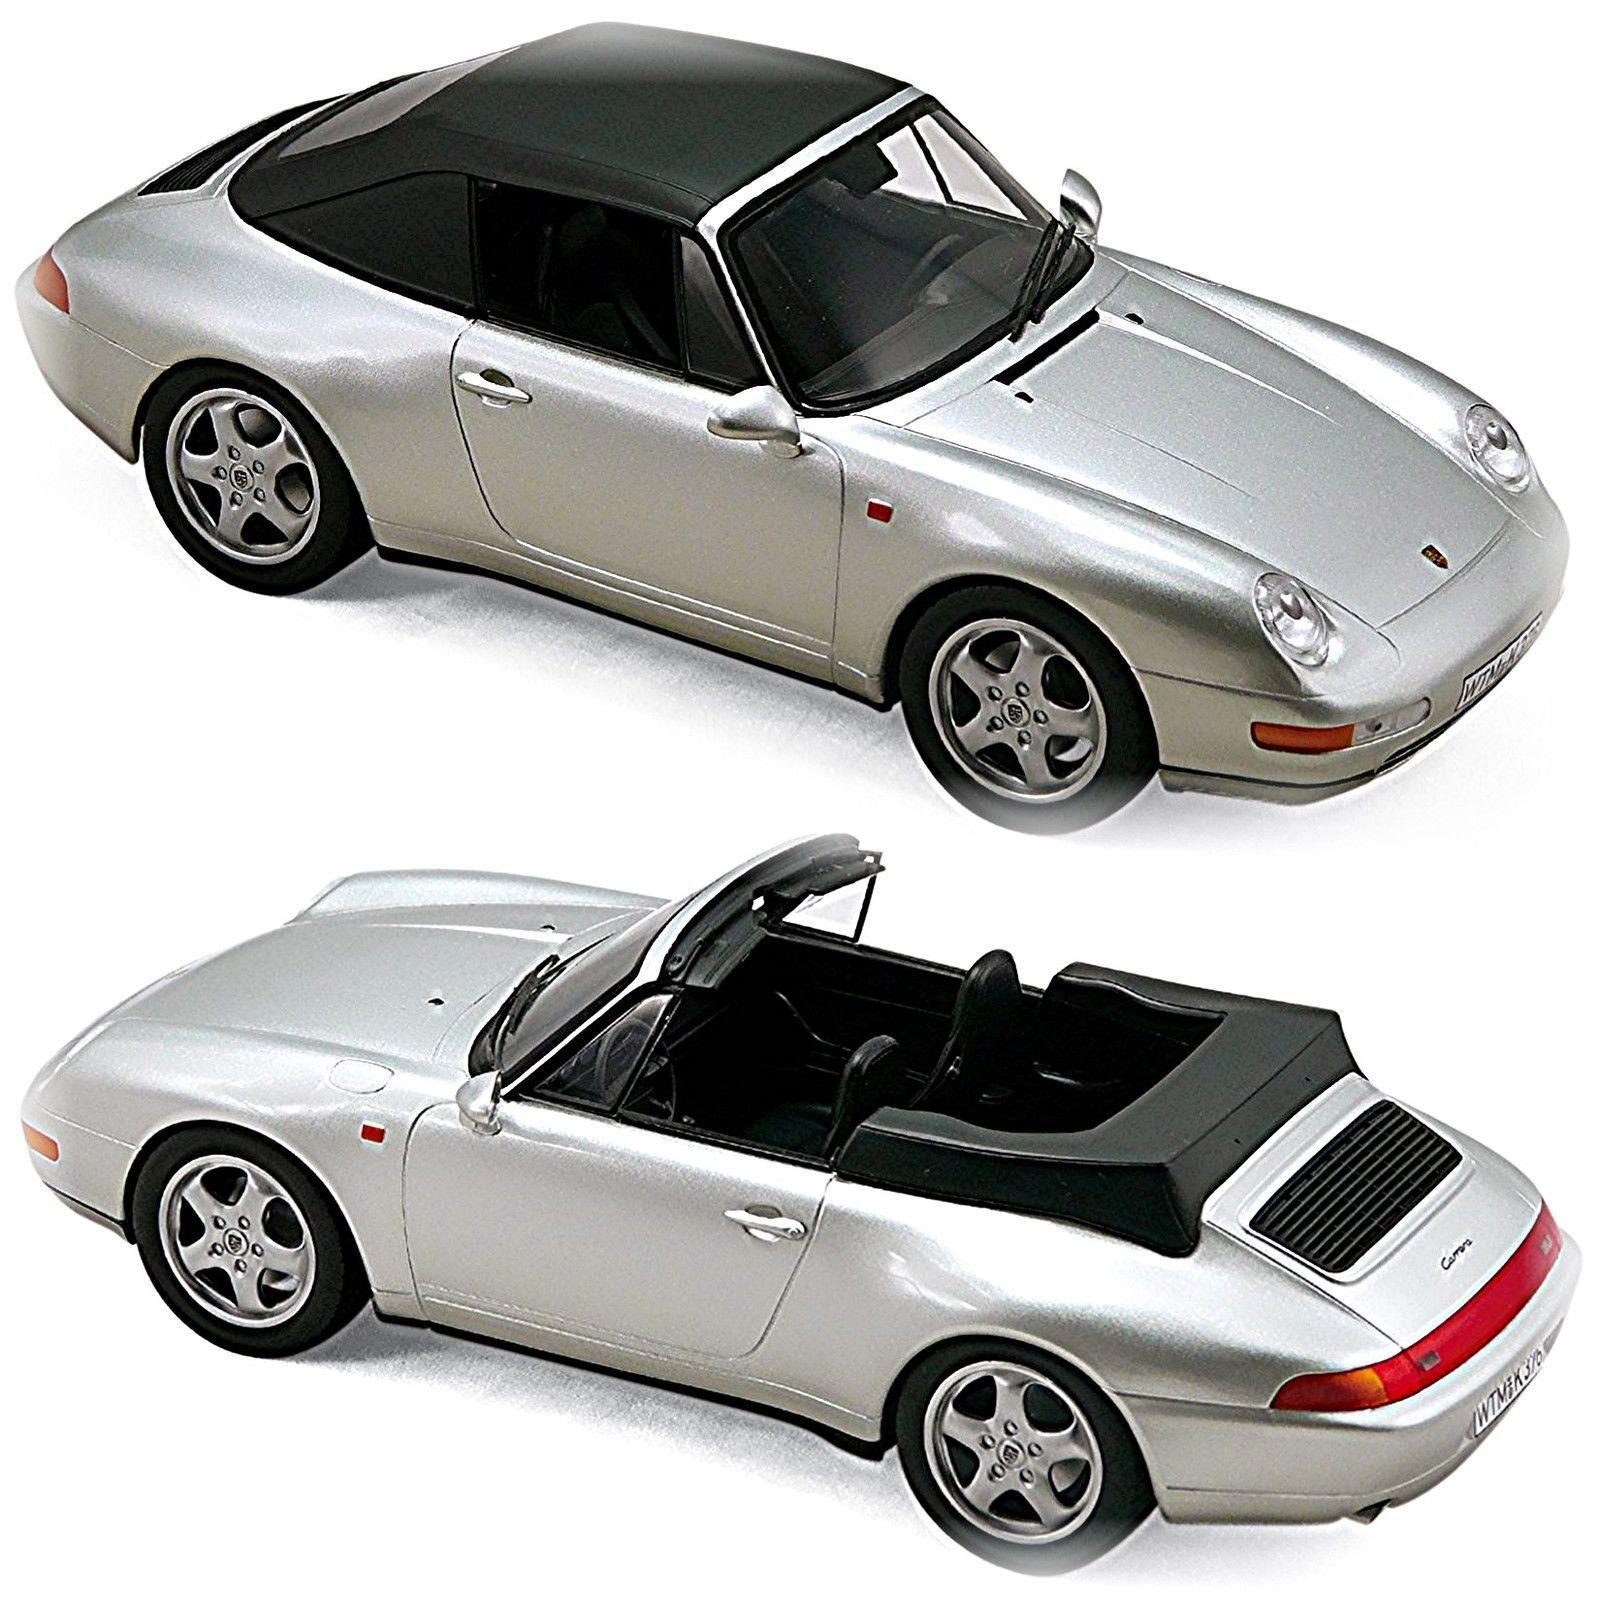 1 18 Novità Norev - Porsche 911 993  voiturerera Cabriolet Cabrio 1994 argent  des prix moins chers